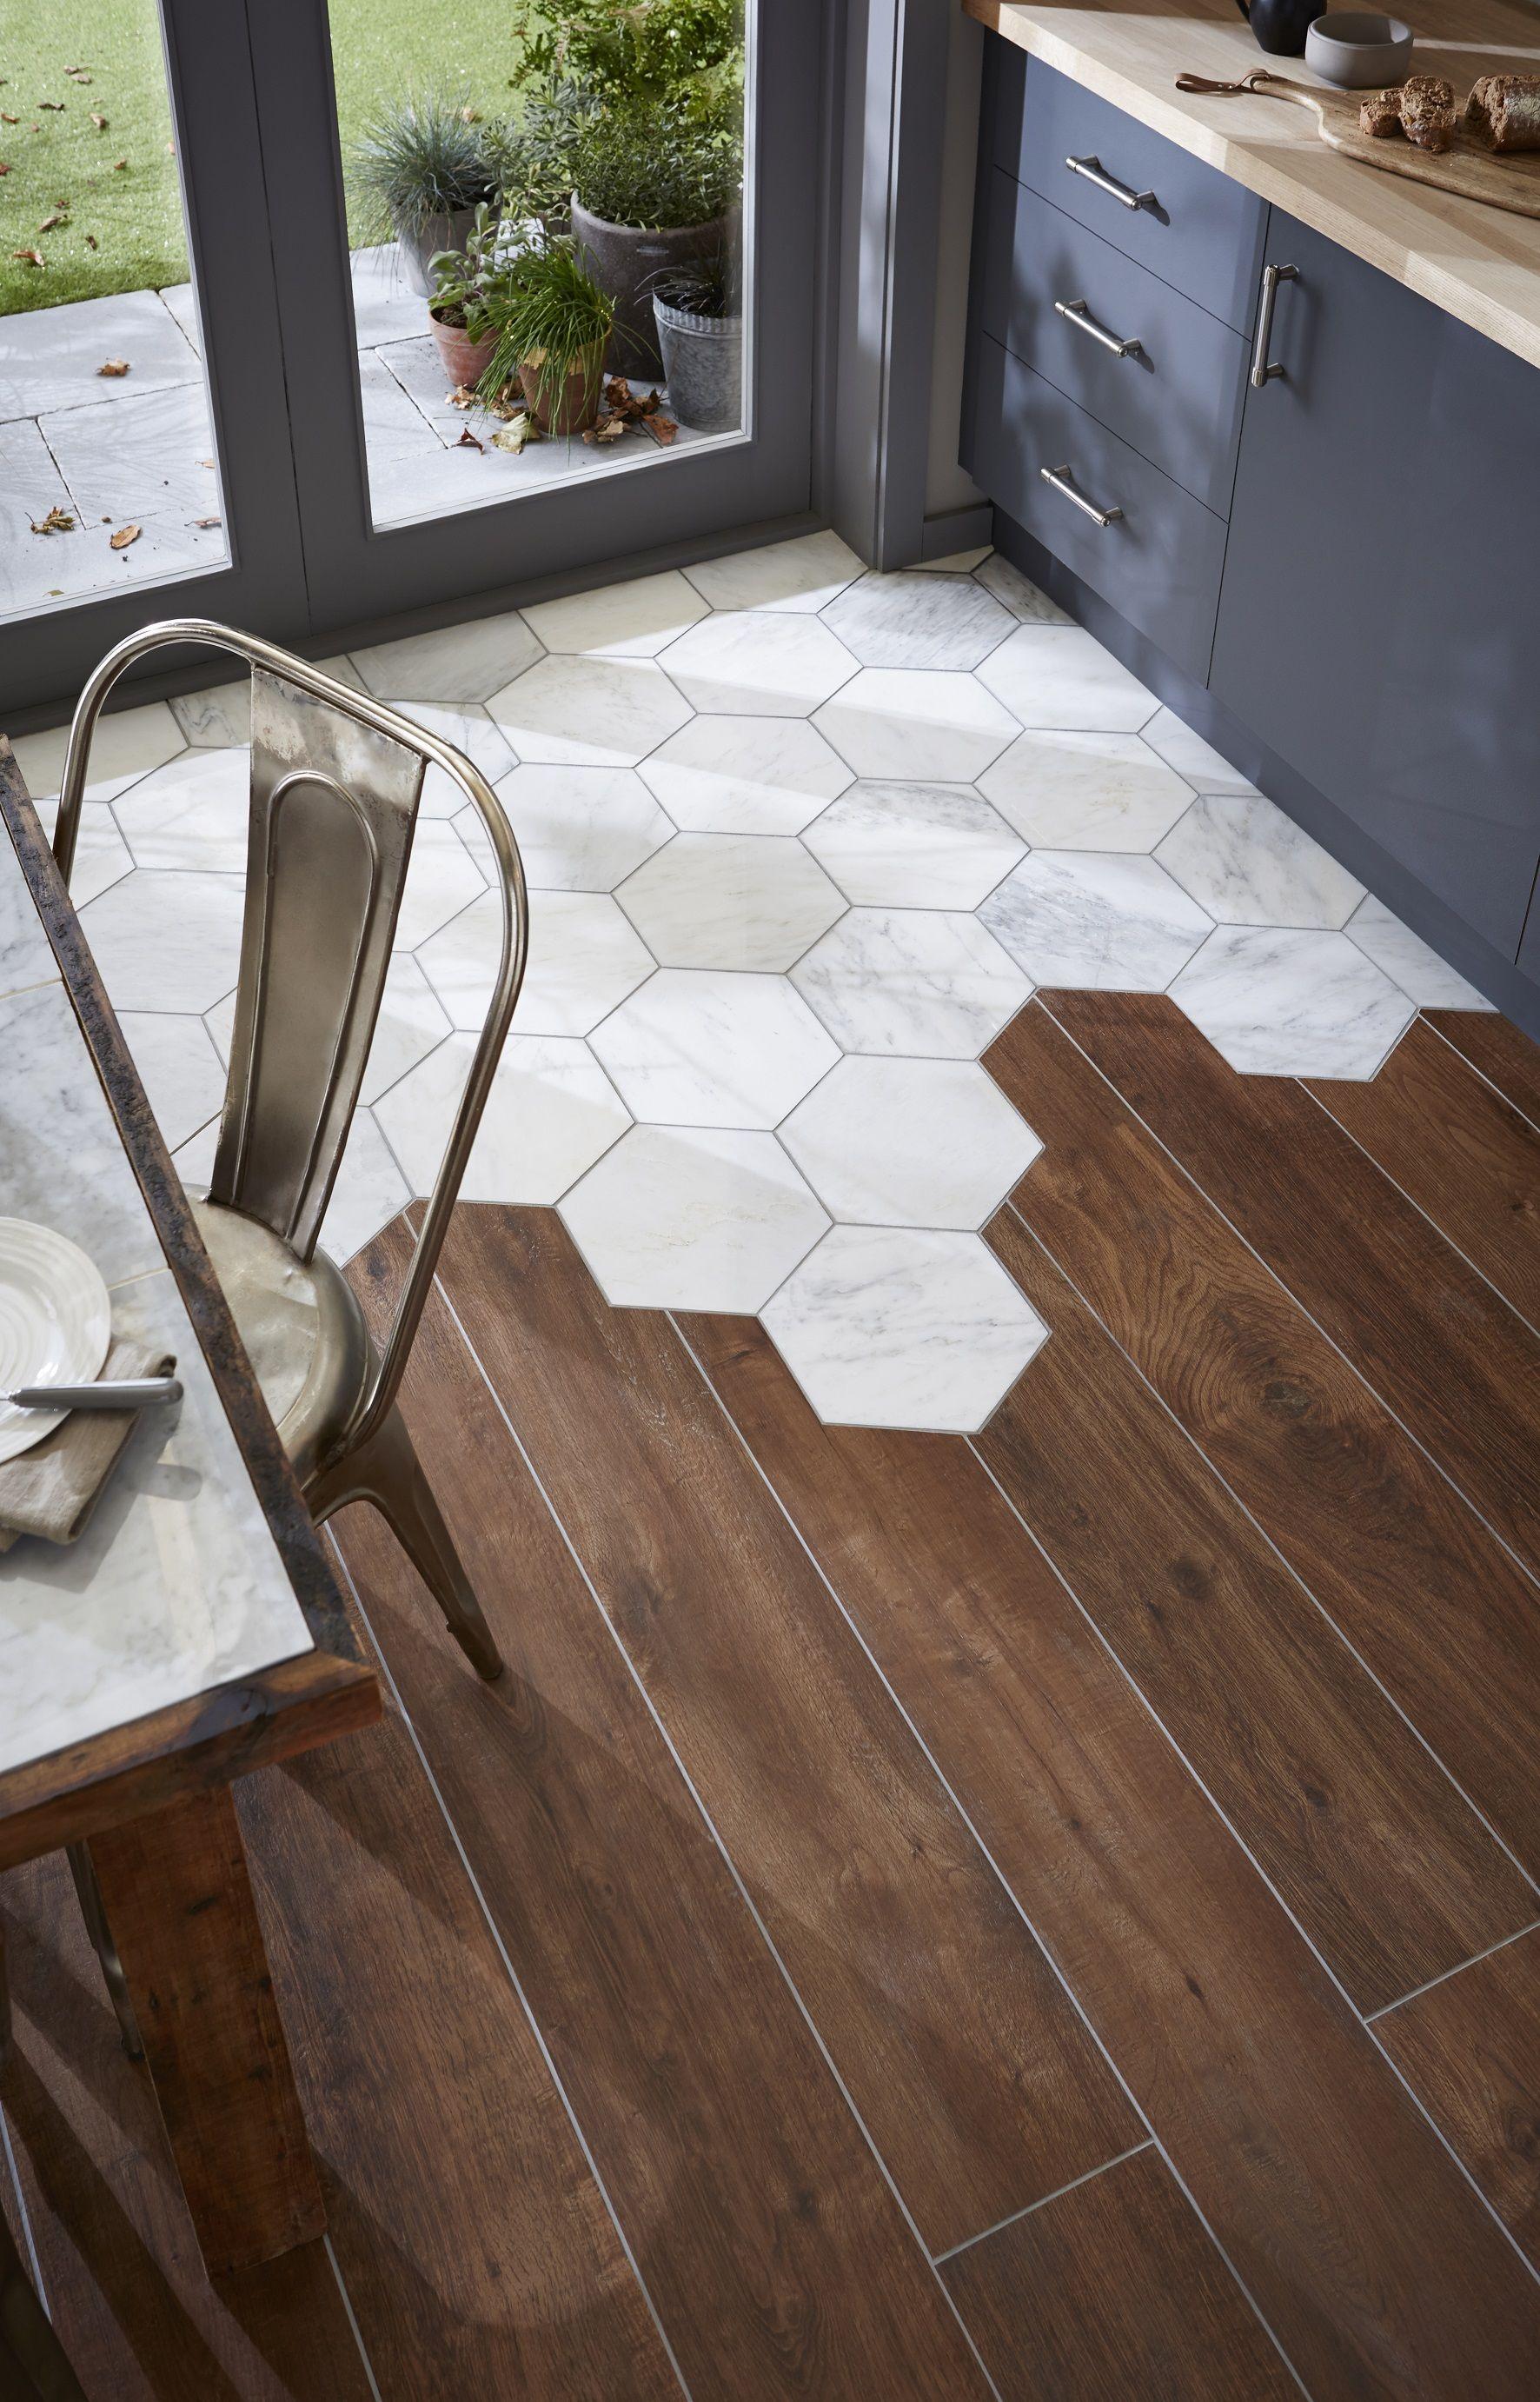 Treverk castagno httptoppstilestprod44667 awesome nice tiling trends 2016 the design sheppard by by modern home dailygadgetfo Choice Image